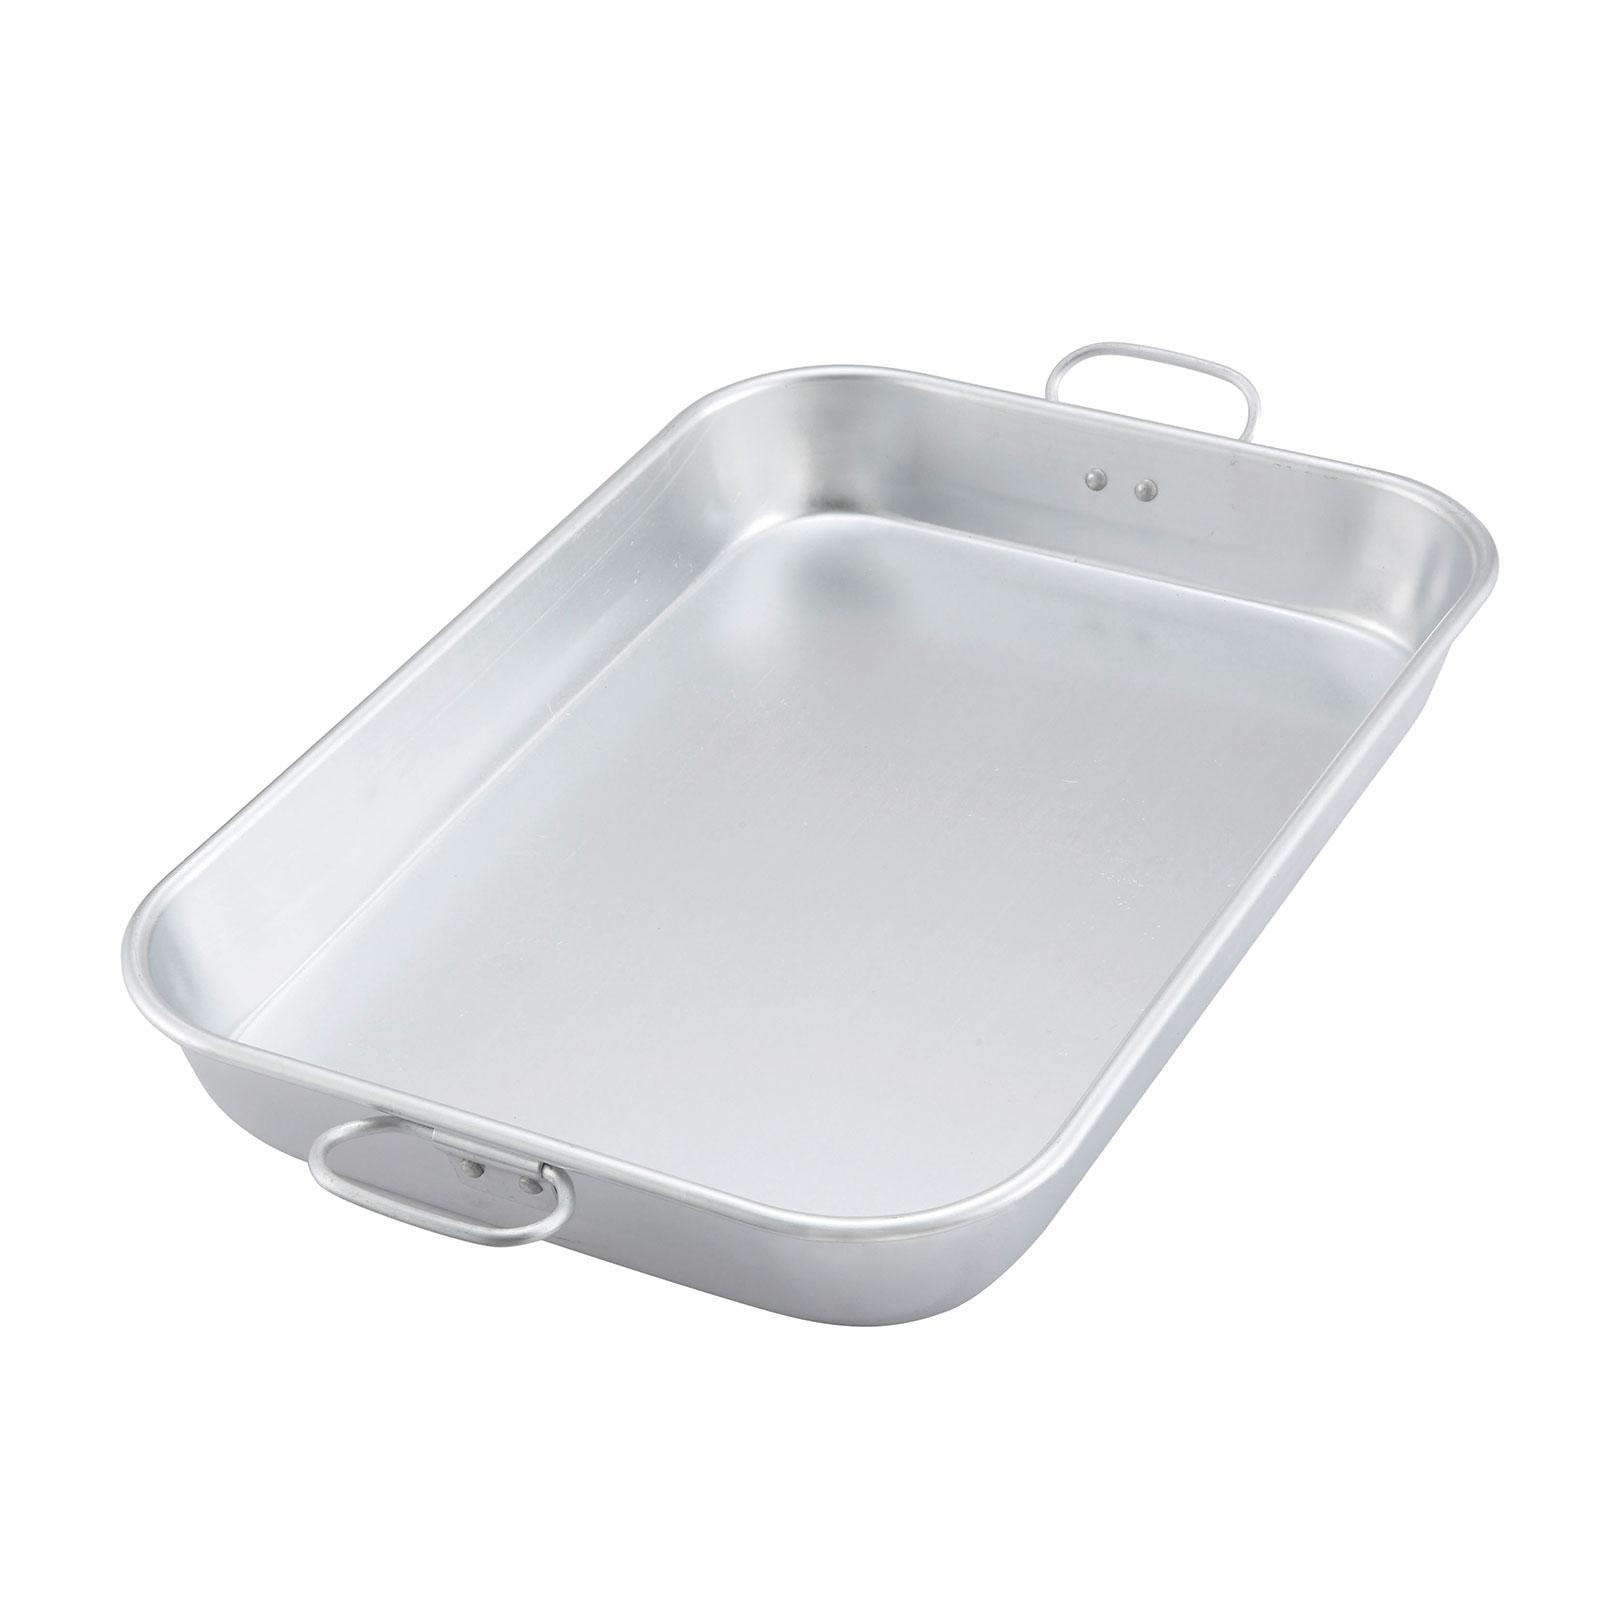 1400-251 Winco ALBP-1218 bake pan